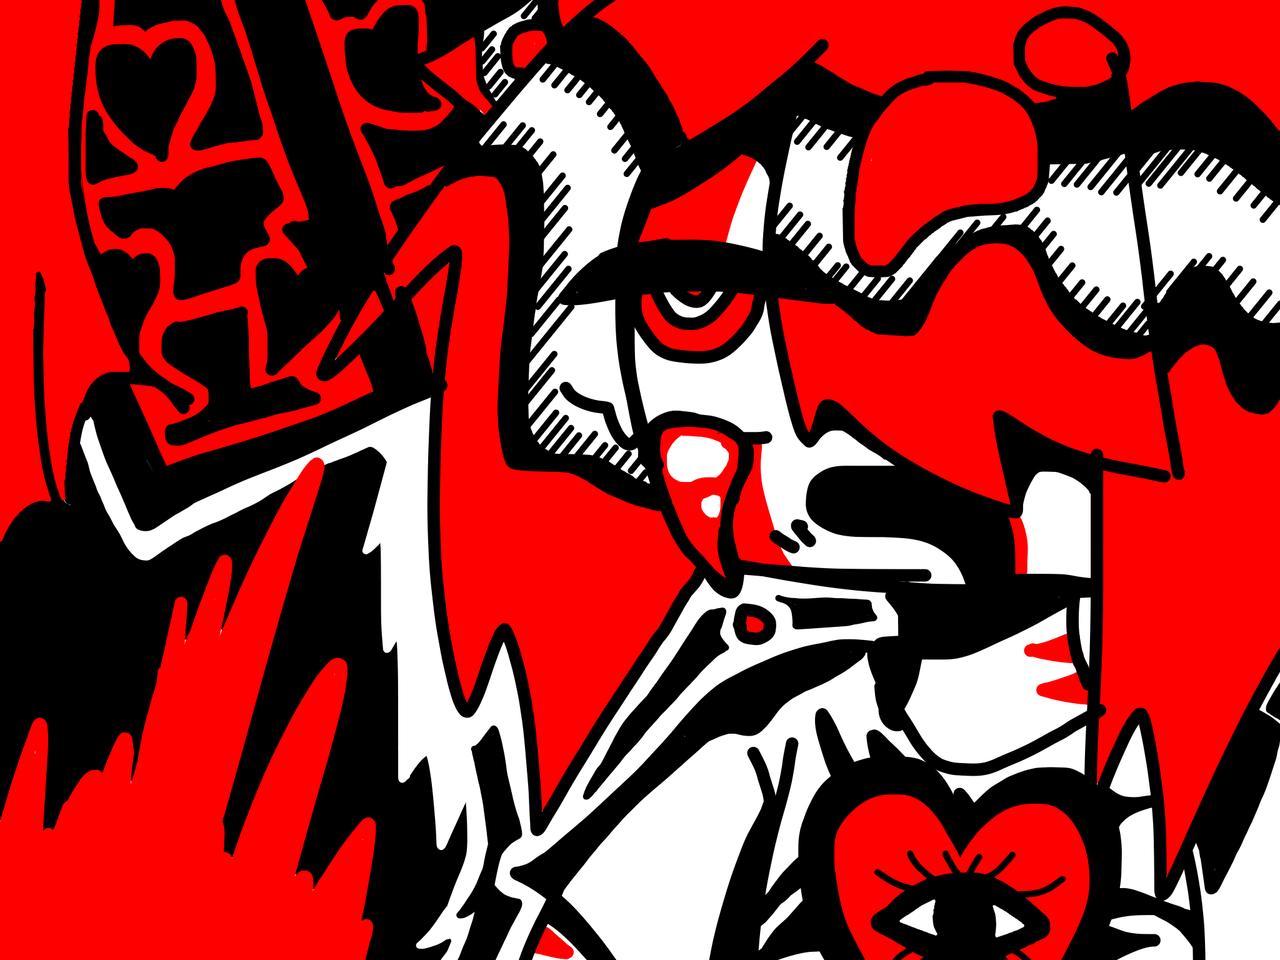 rkgk Illust of 🥩𝕋𝕚𝕦🥩 black medibangpaint rkgk red